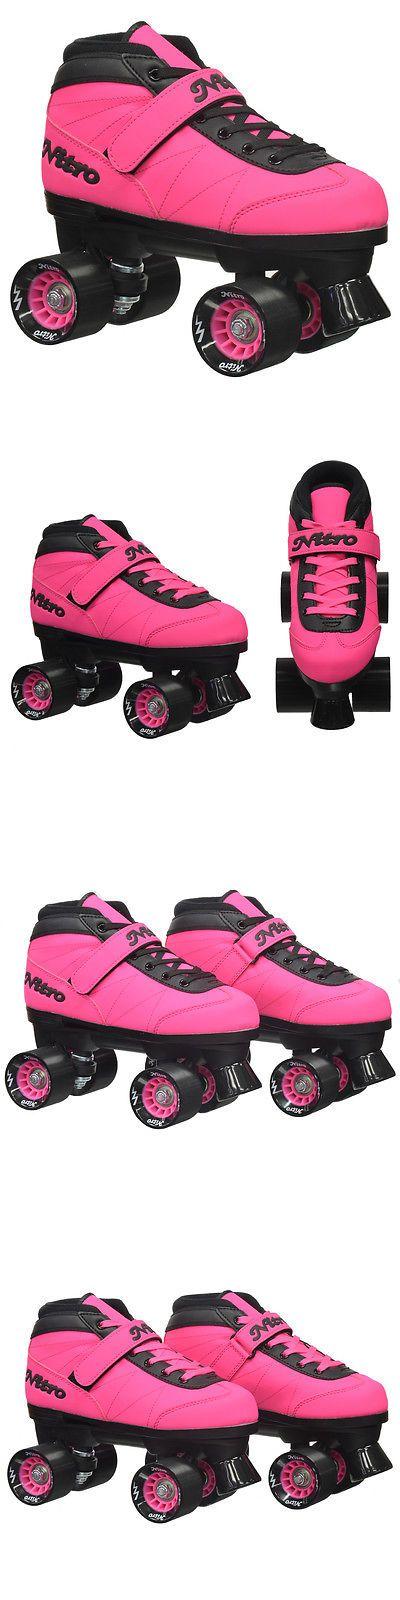 Men 71155: Epic Nitro Turbo Pink Quad Speed Roller Skates -> BUY IT NOW ONLY: $79.99 on eBay!